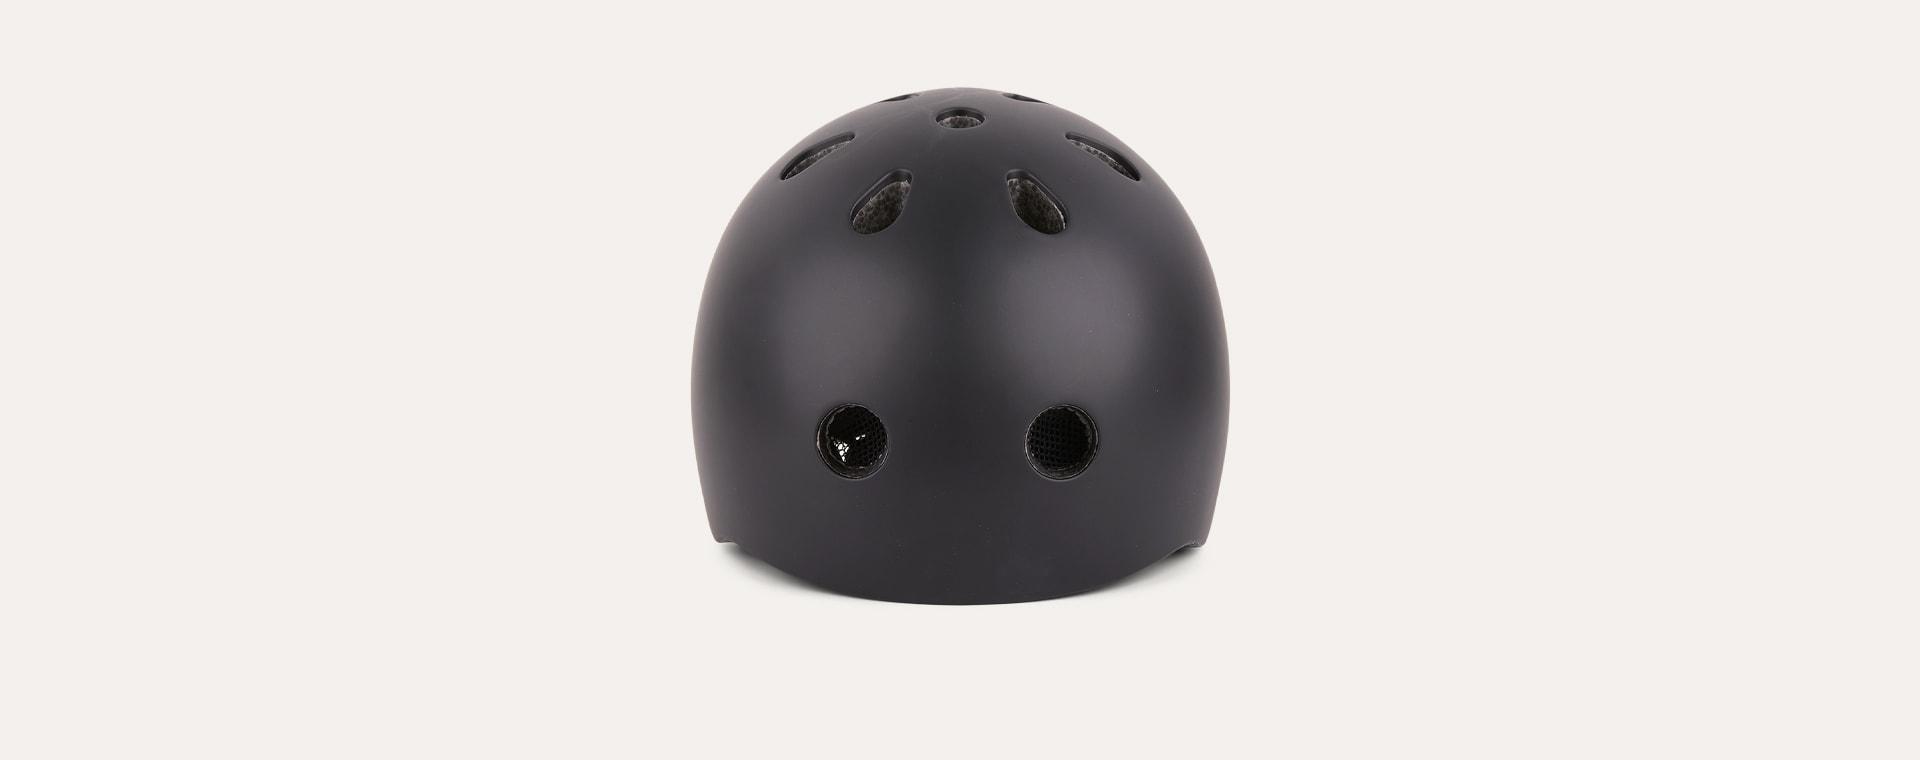 Black and Gold Scoot & Ride Highway Kick 1 Helmet